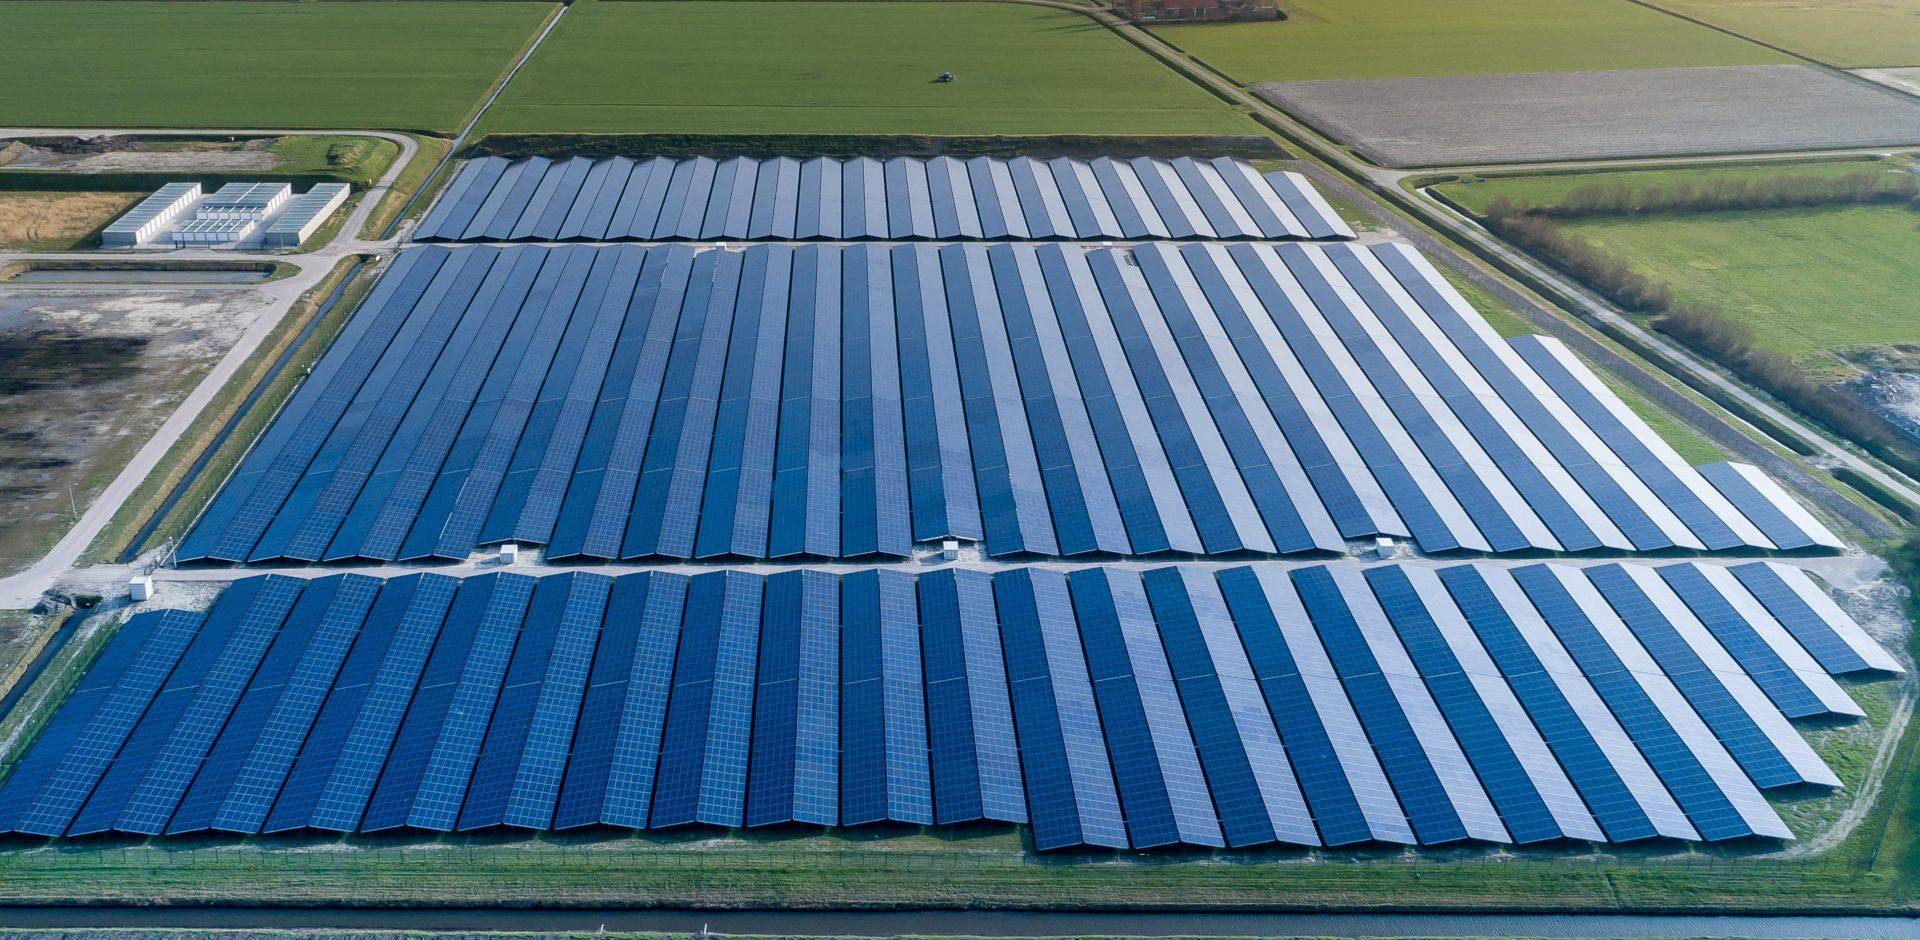 Solar park with East-West orientation